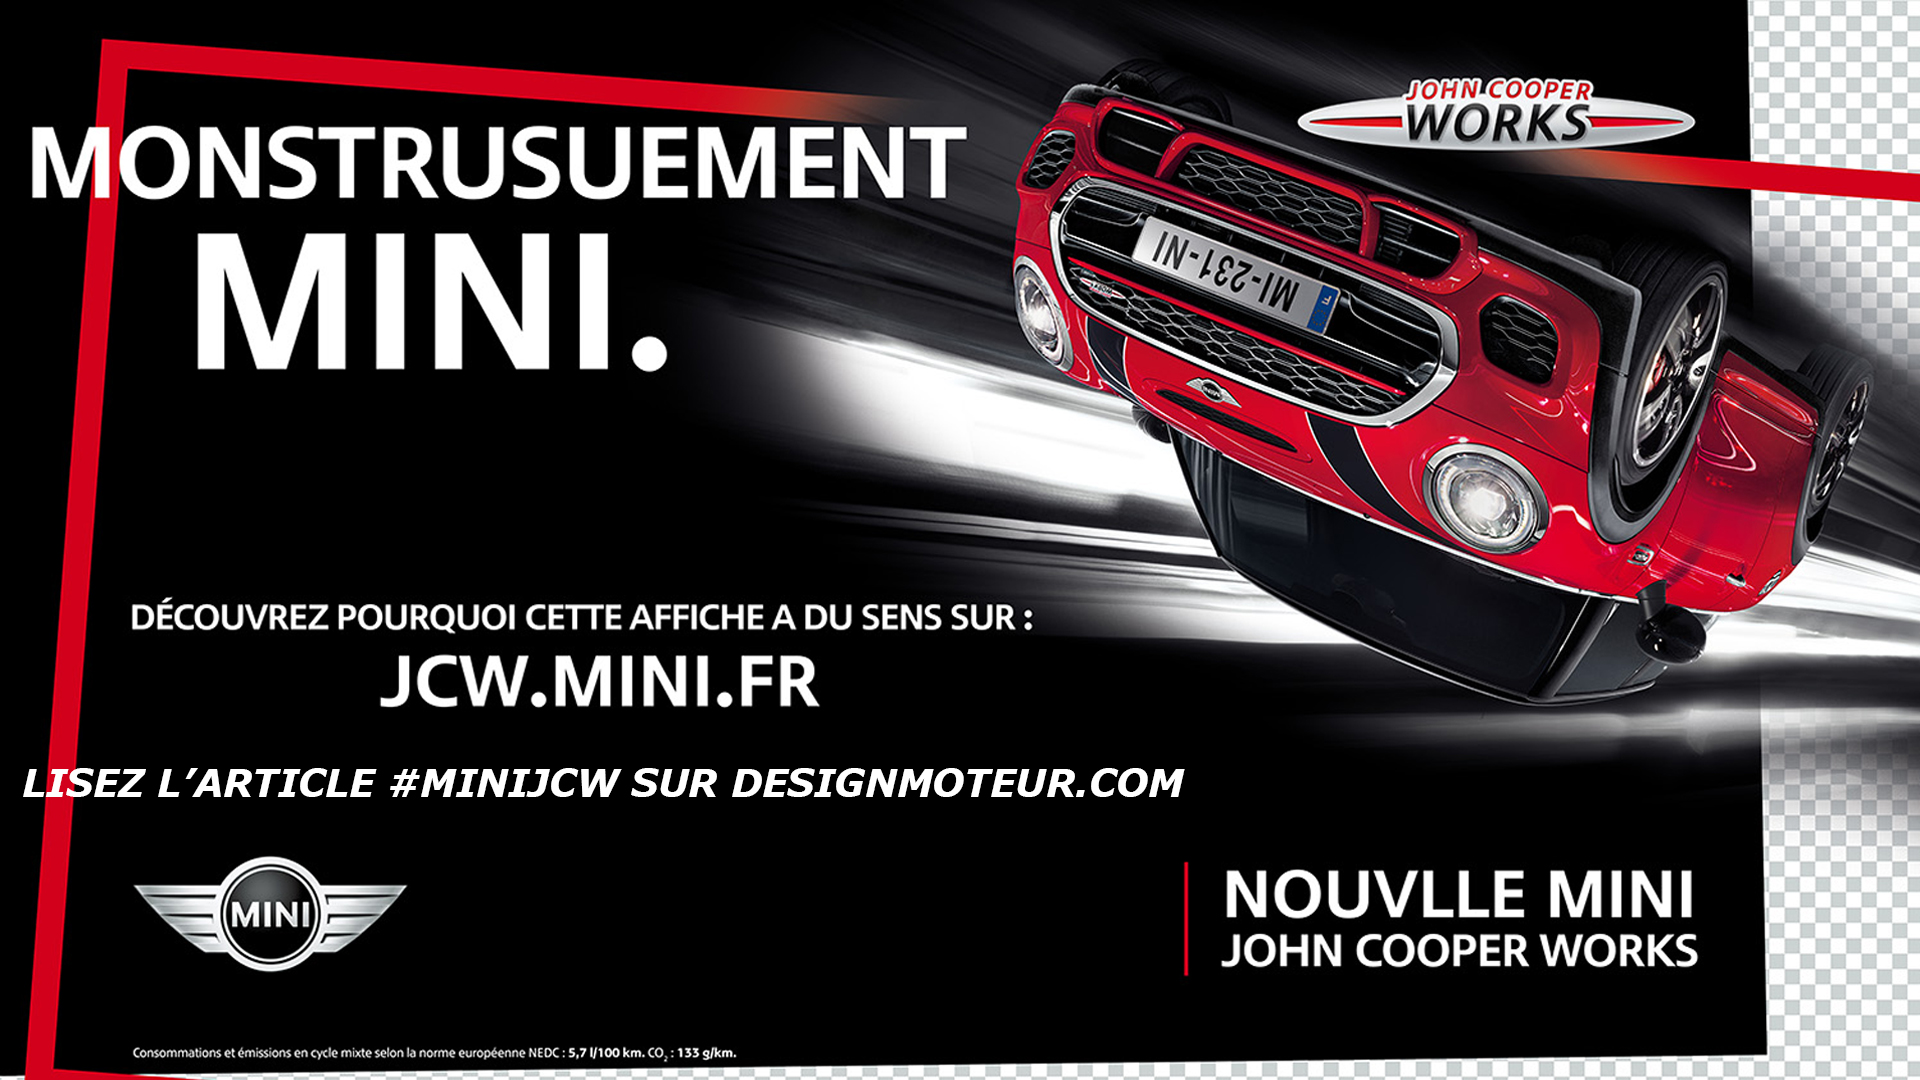 Print Monstrueusement MINI (DESIGNMOTEUR)